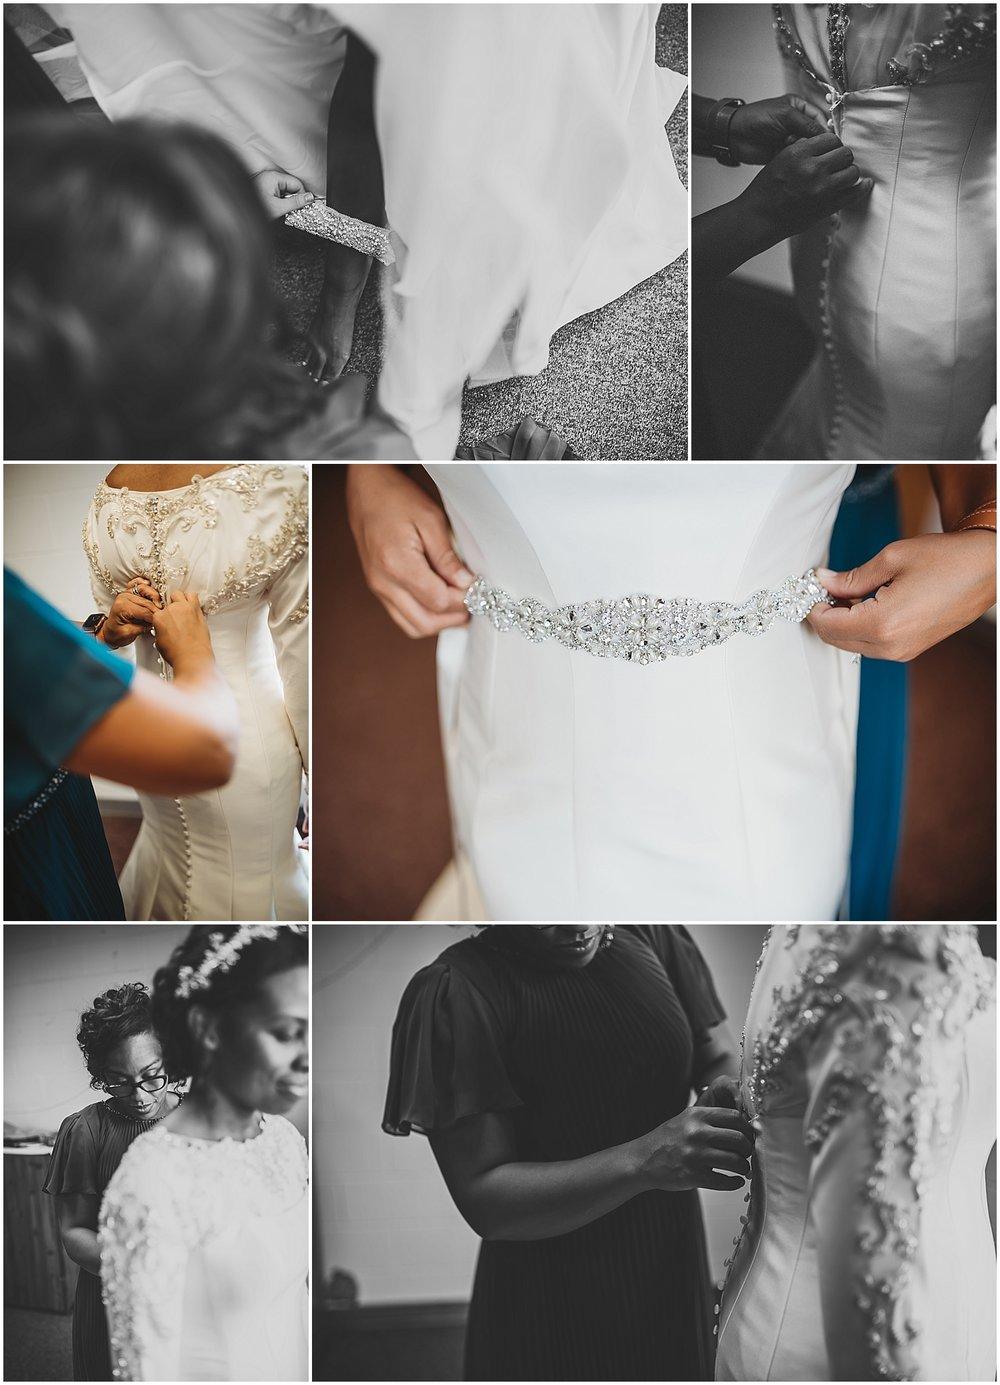 NEPA-Scranton-wedding-engagement-photographer-in-York-PA-Central-PA_0104.jpg